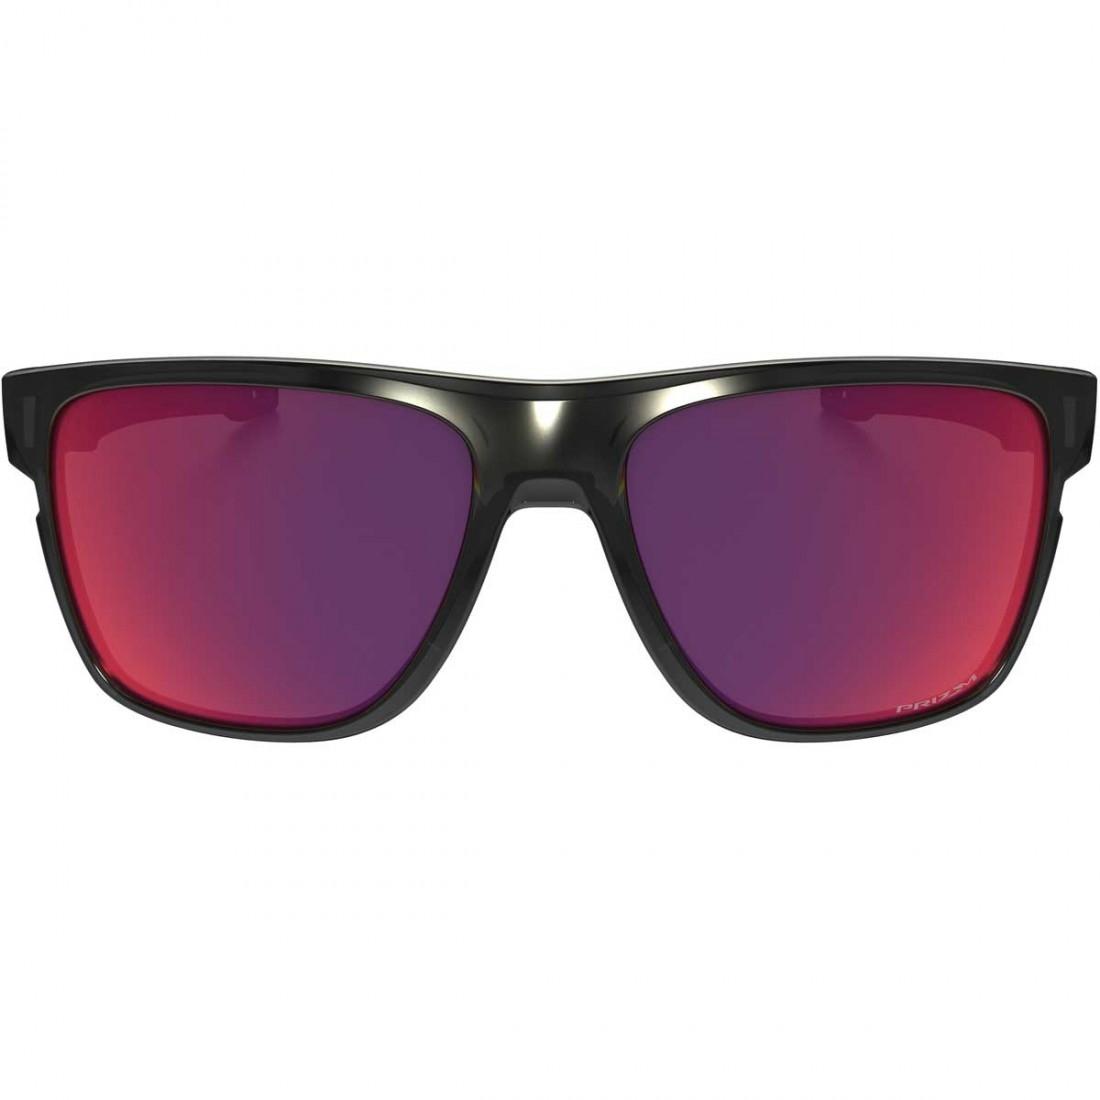 7802d350c1 Gafas de sol OAKLEY Crossrange XL Black Ink / Prizm Road · Motocard